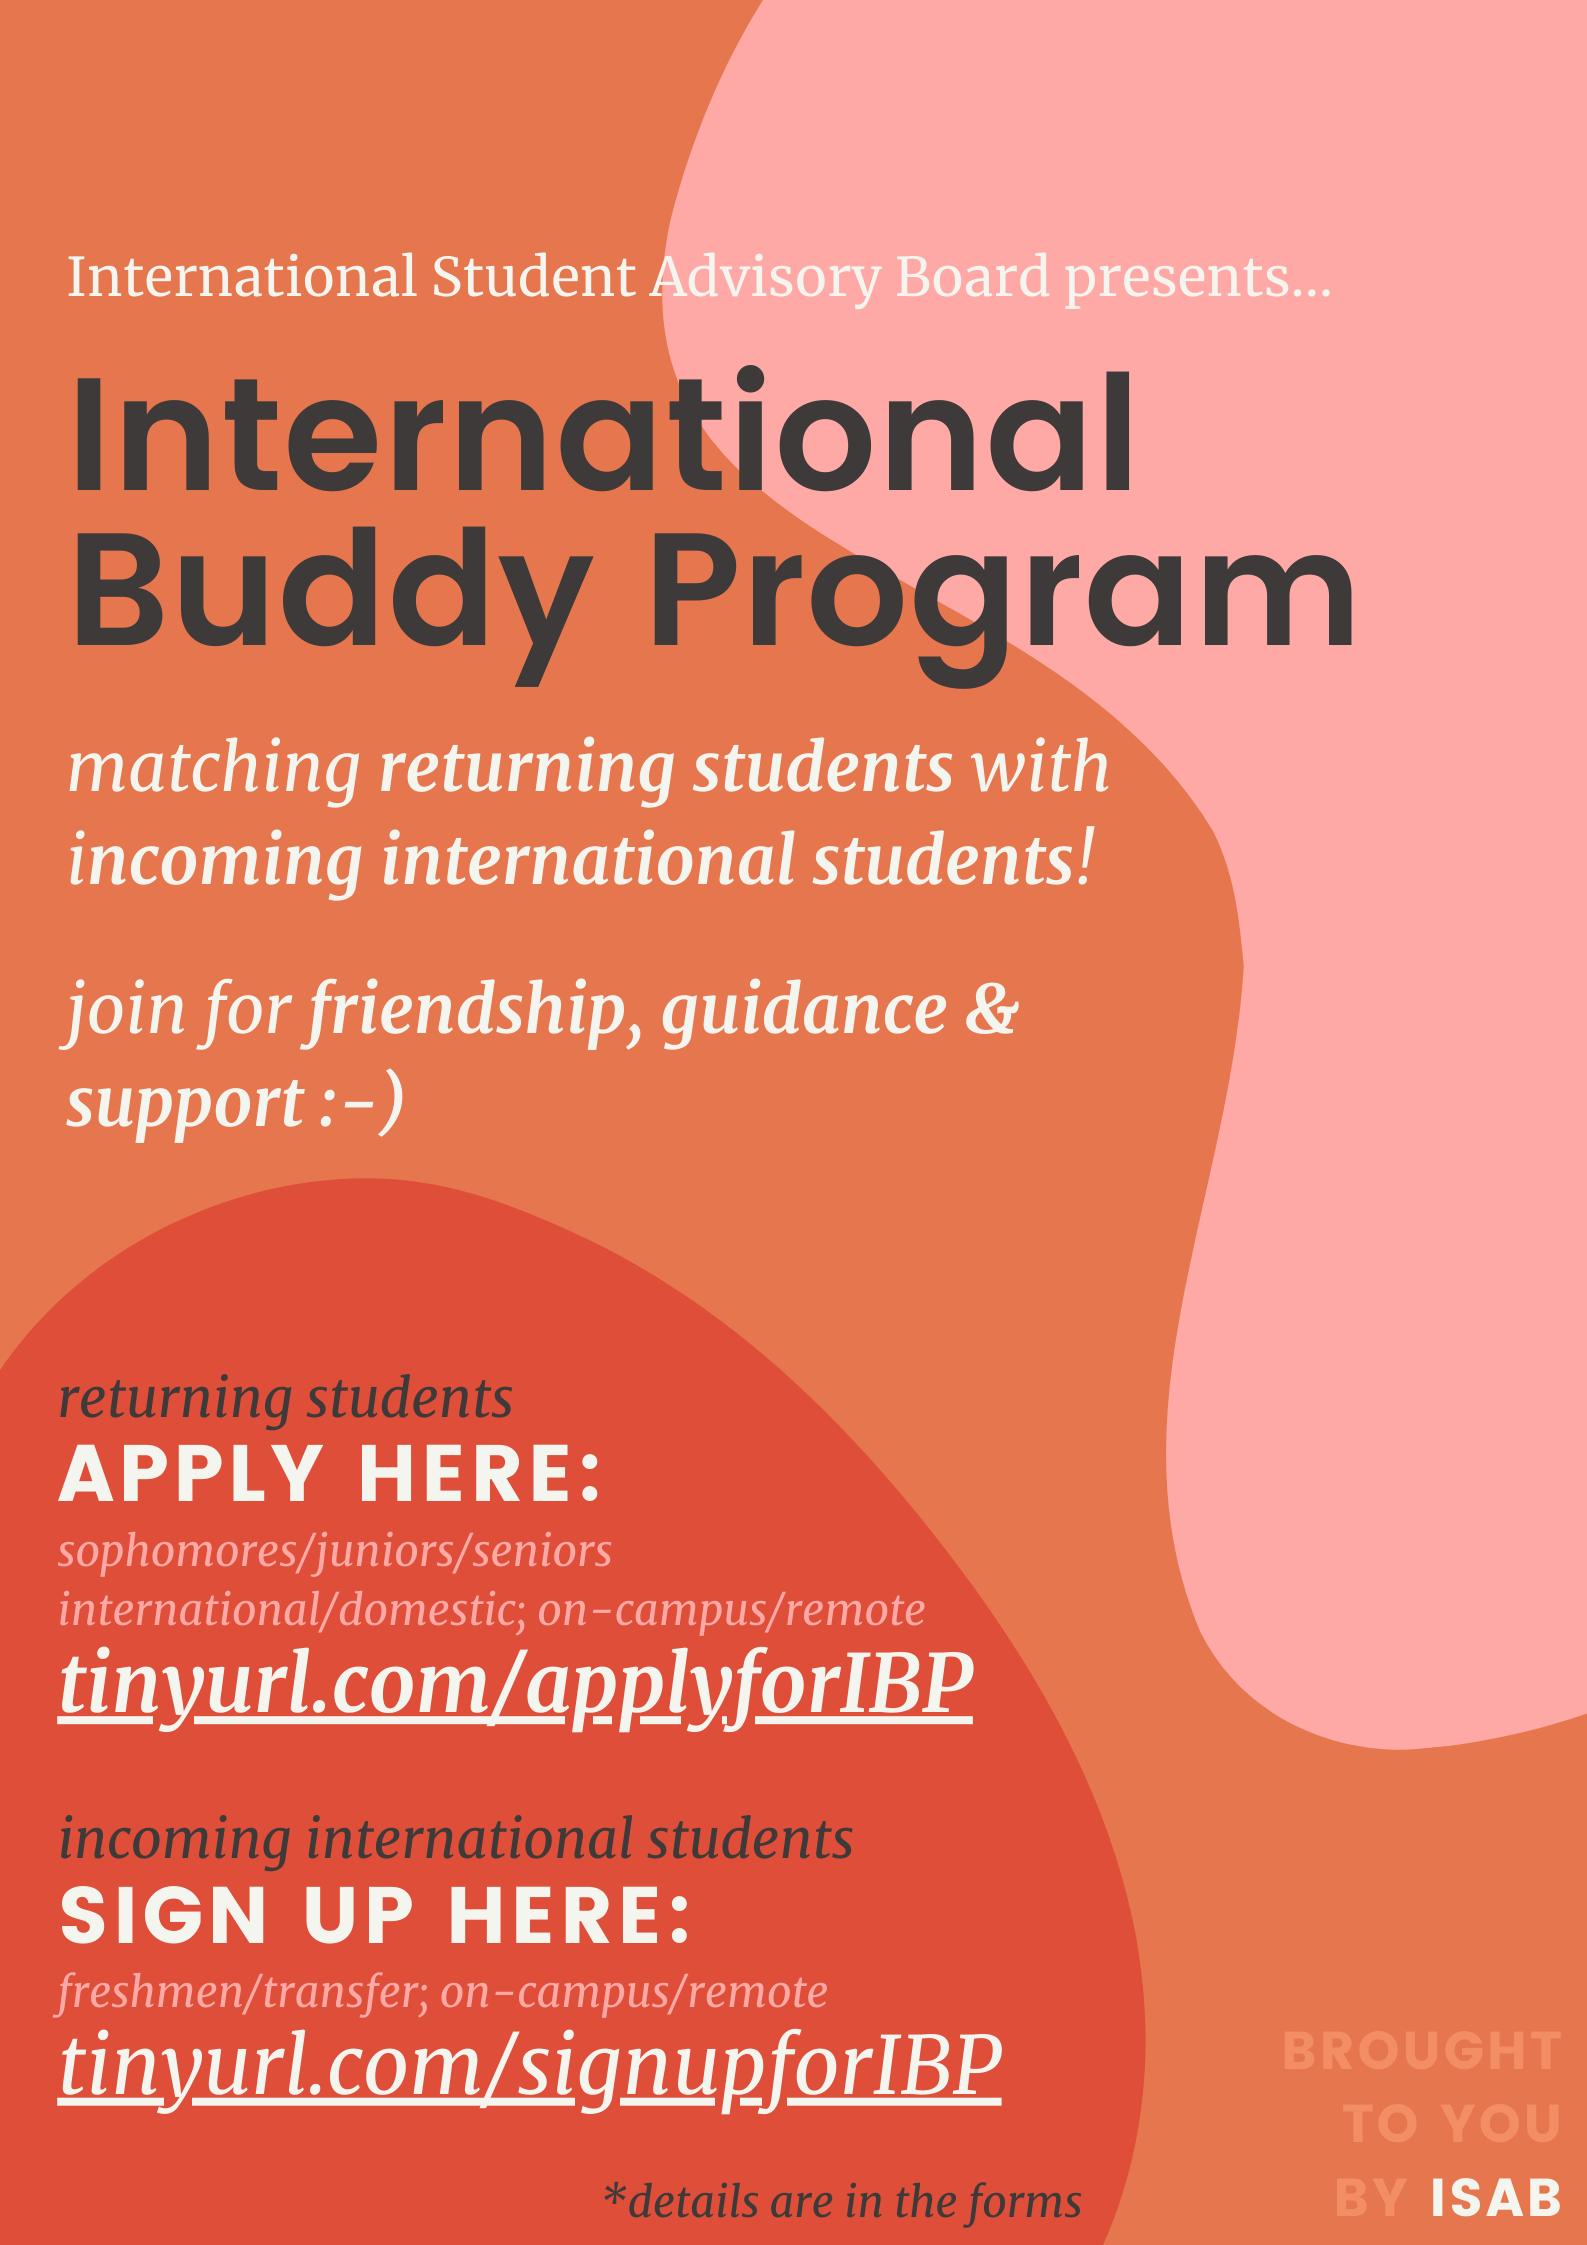 c/o Office of International Student Affairs